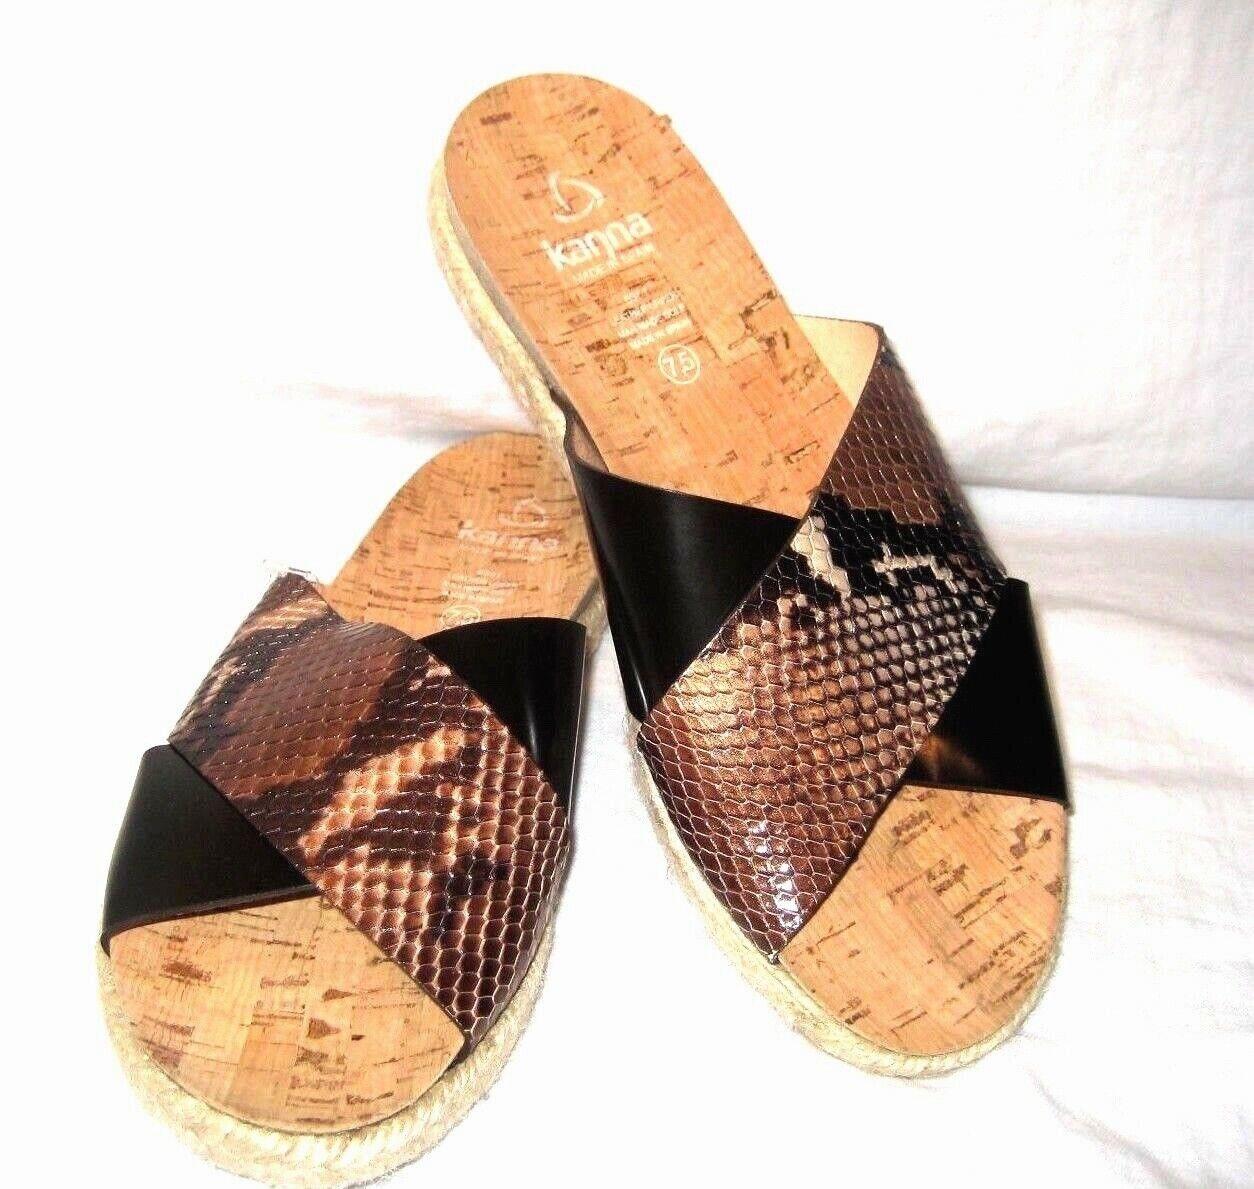 Kanna Womens Leather Snakeskin Flat Espadrille Slides Sandals 7.5 Black Brown